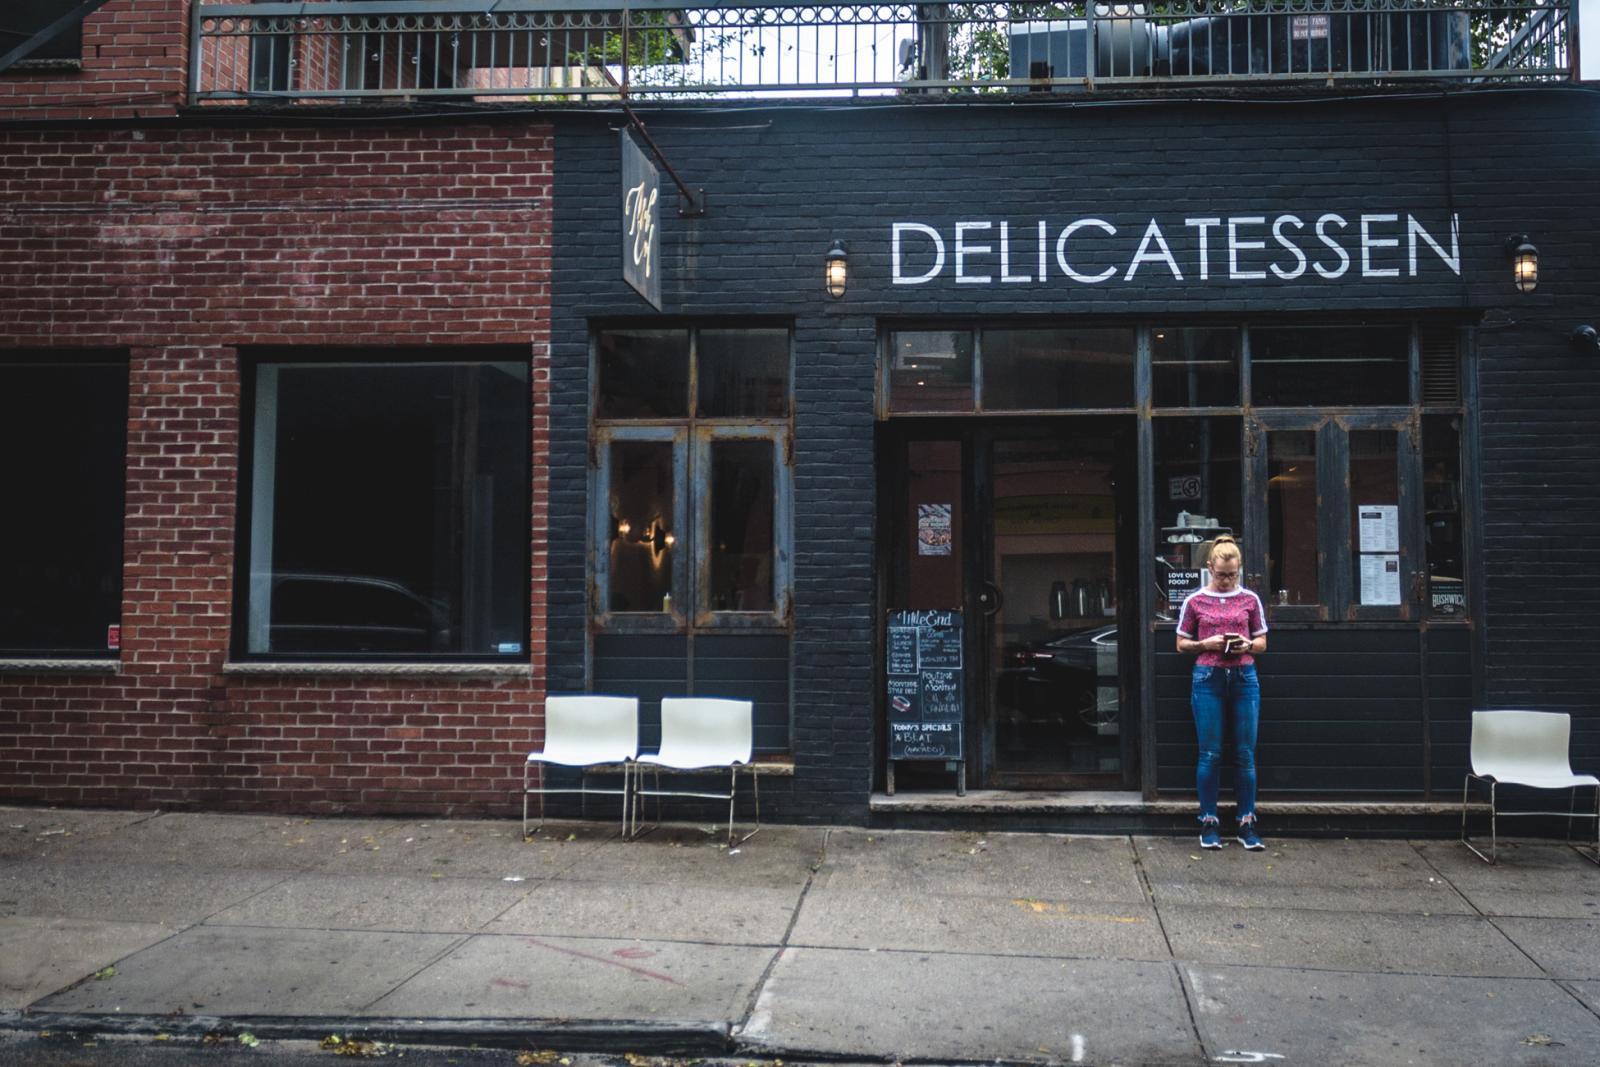 Mile End Delicatessen Brooklyn